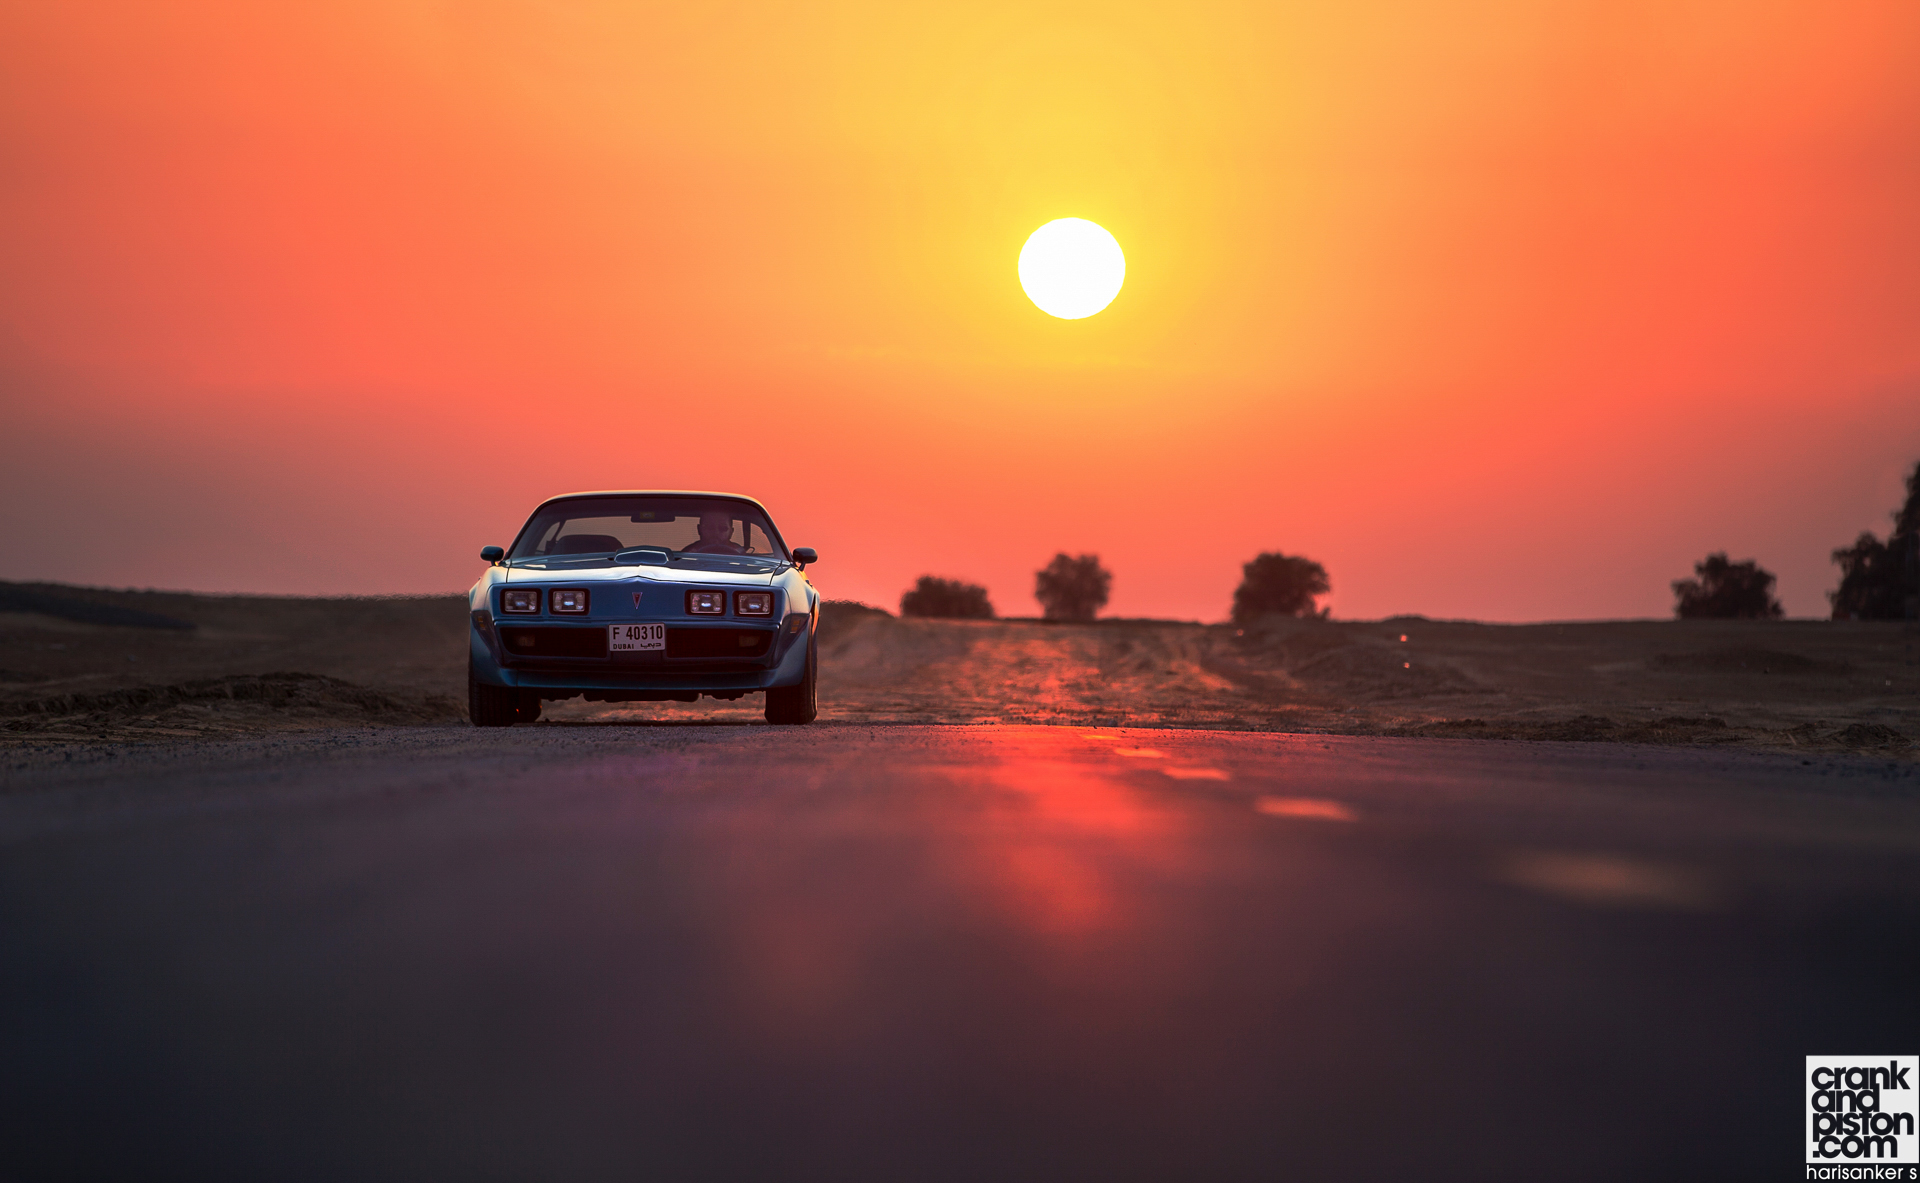 1979 Pontiac Firebird Trans Am crankandpiston Wallpapers 8 1920x1183